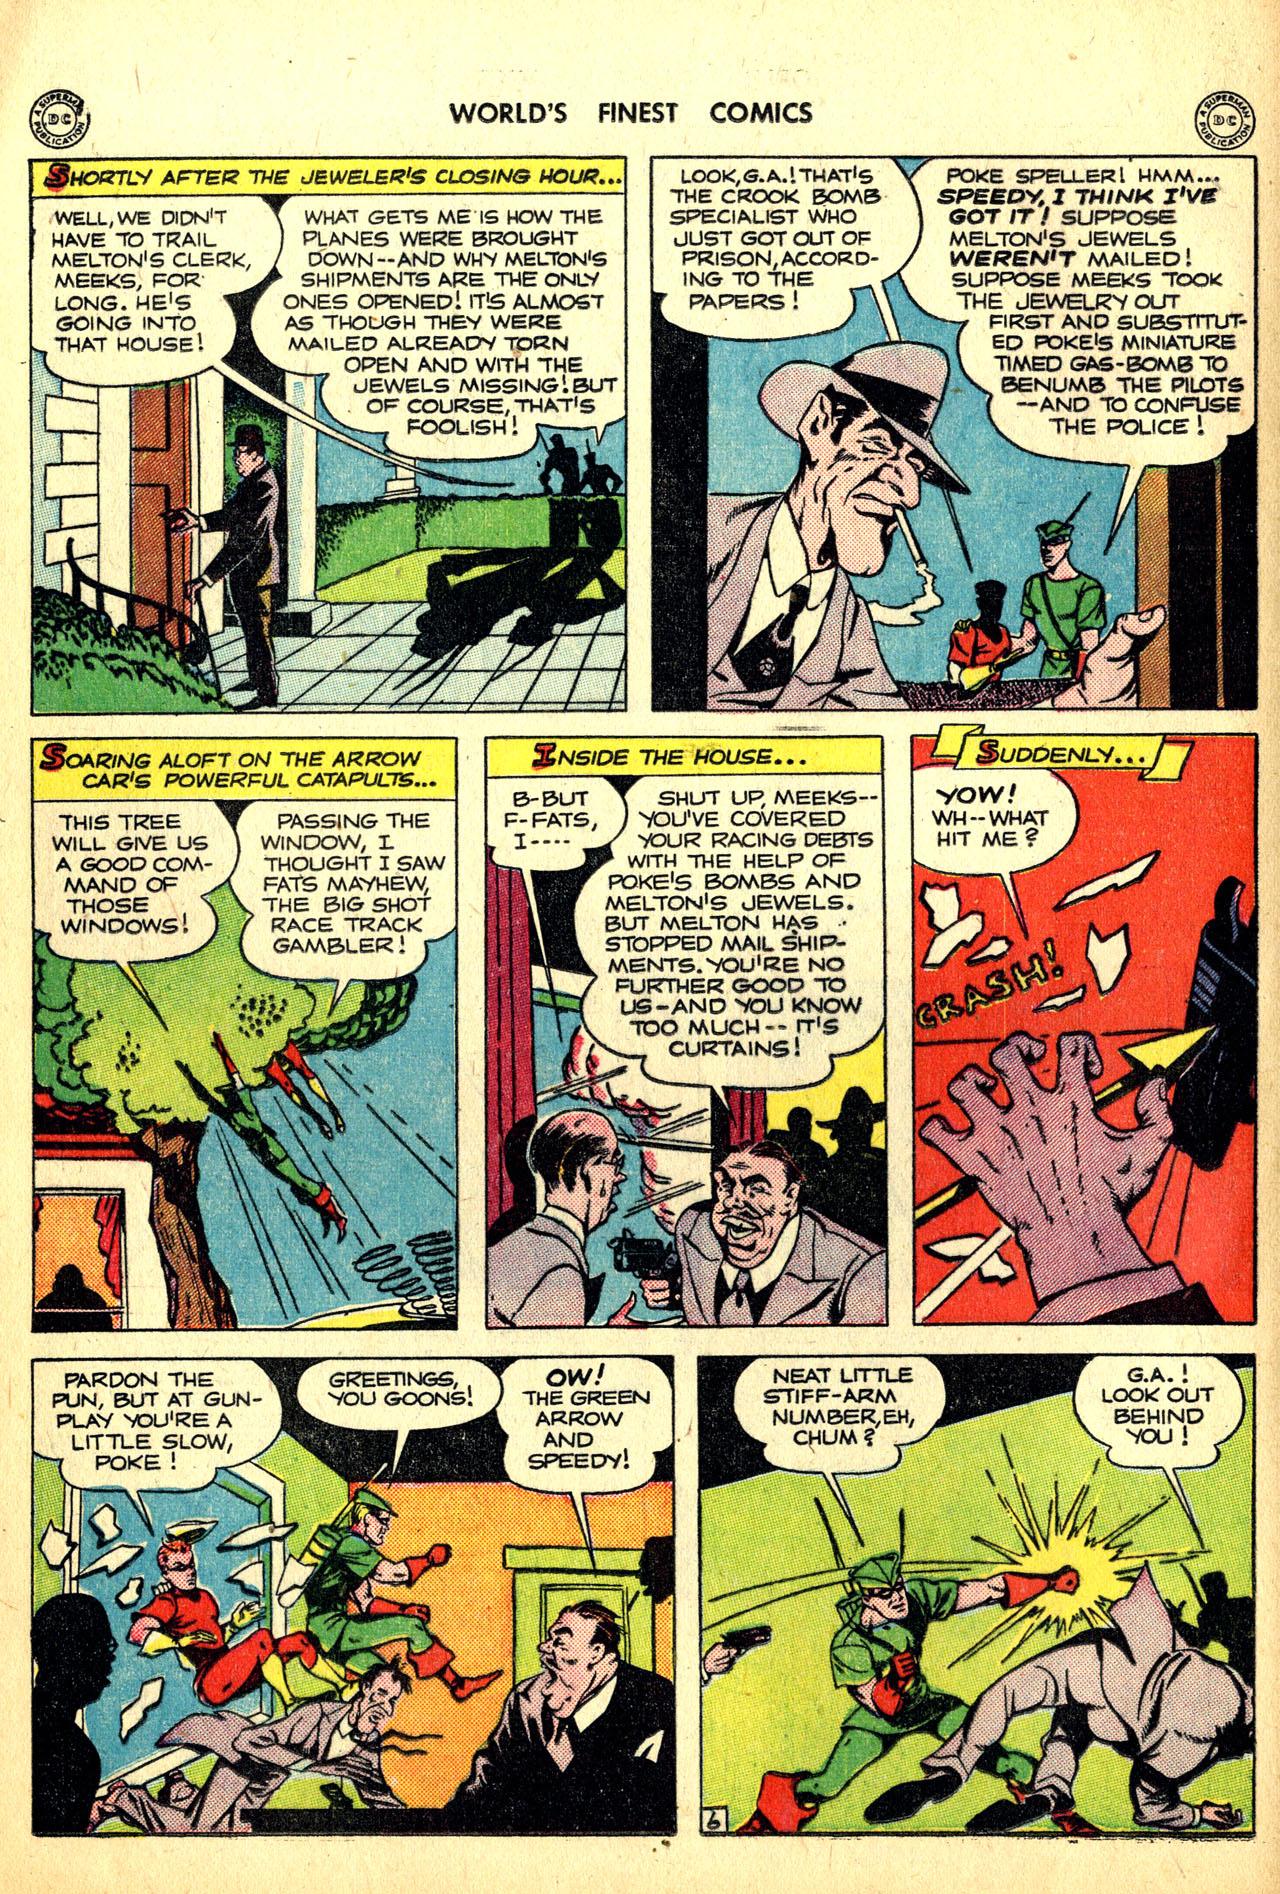 Read online World's Finest Comics comic -  Issue #18 - 54